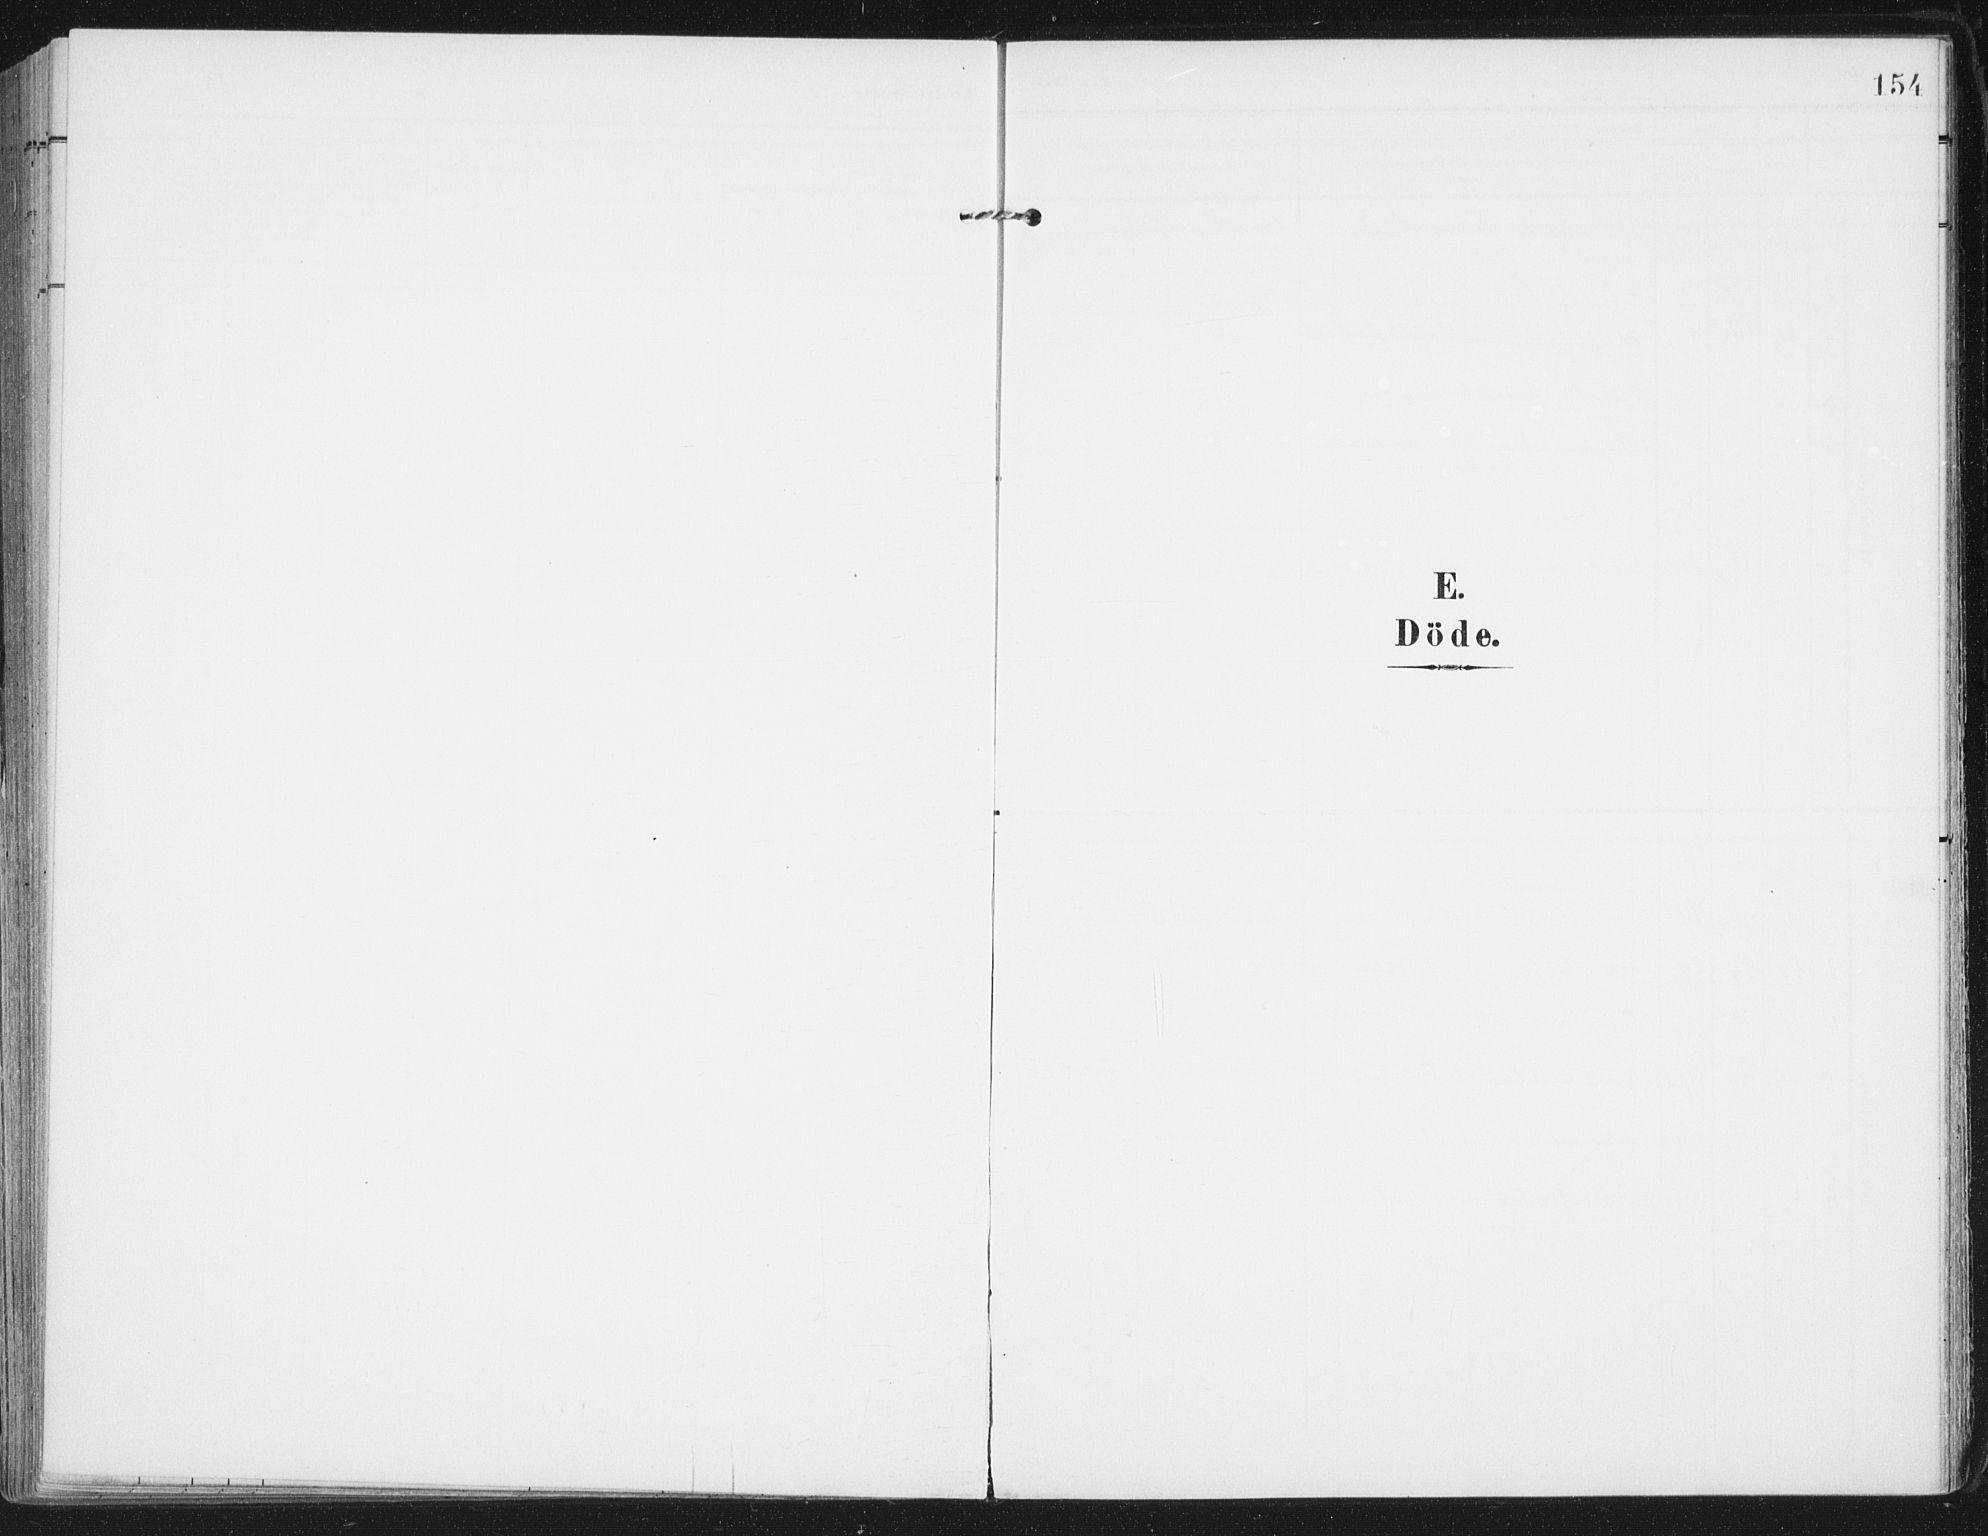 SAT, Ministerialprotokoller, klokkerbøker og fødselsregistre - Nordland, 892/L1321: Ministerialbok nr. 892A02, 1902-1918, s. 154